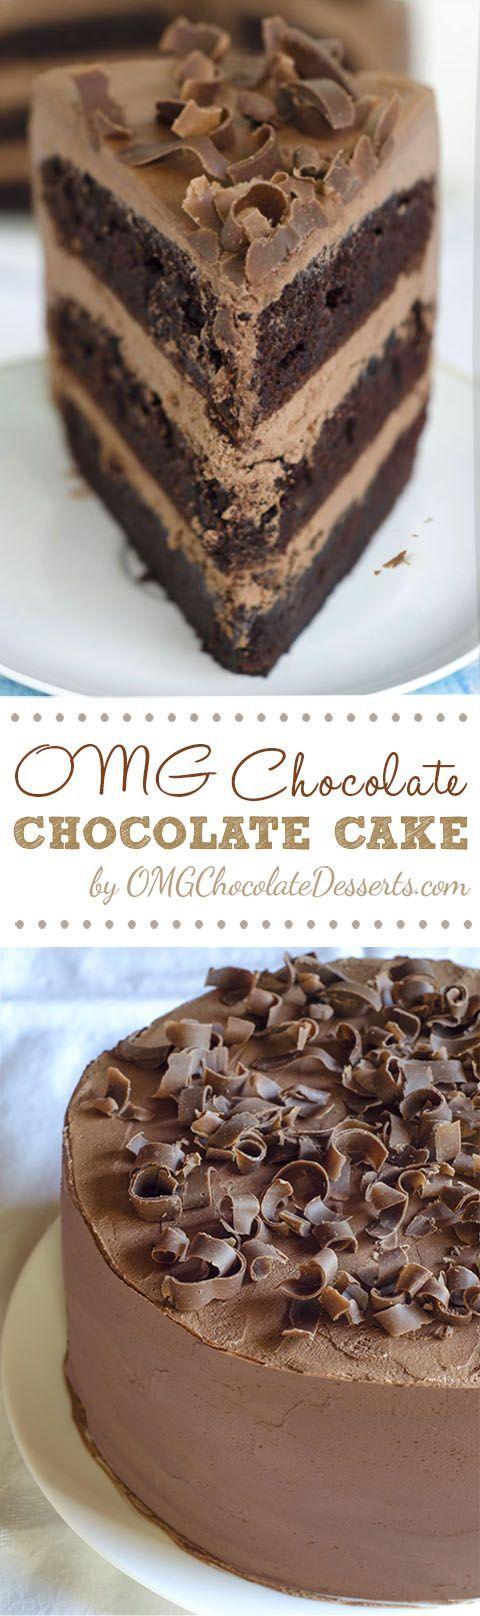 Check why is this cake called OMG Chocolate Chocolate Cake! True pleasure for real chocoholic. Decadent Hershey chocolate cake. | OMGChocolateDesse... #chocolate #cake